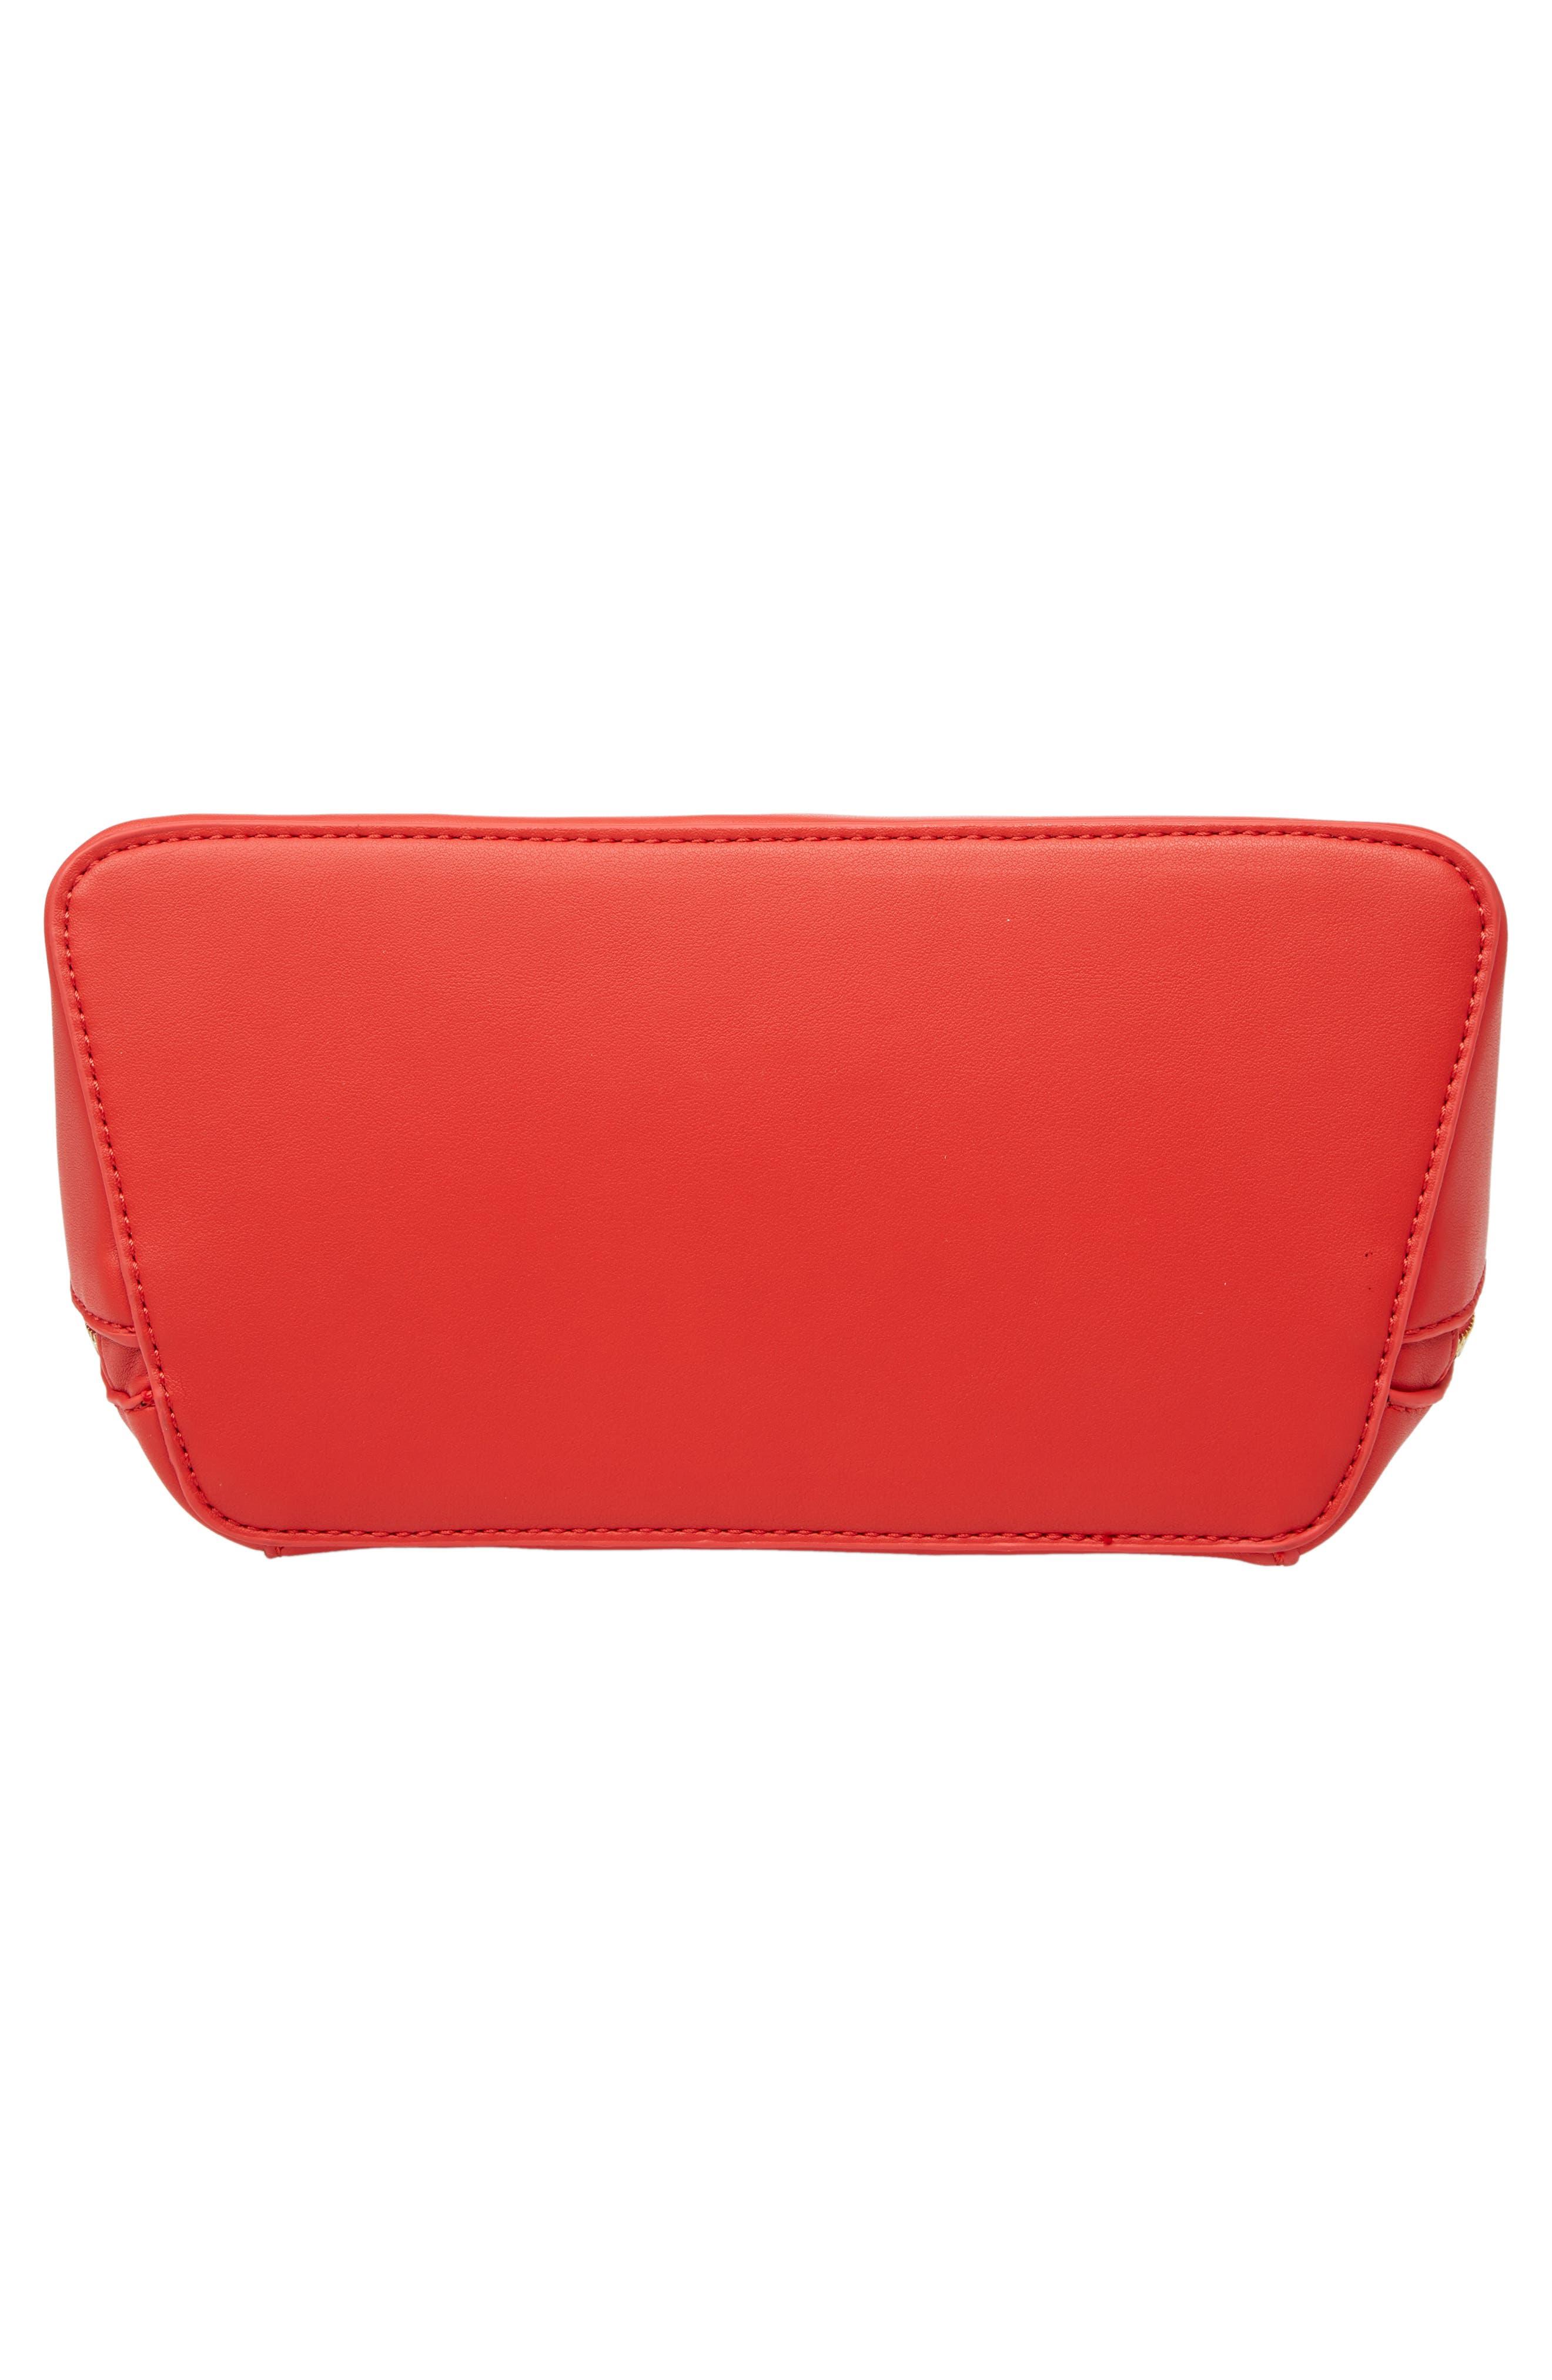 Top Handle Crossbody Bag,                             Alternate thumbnail 6, color,                             600